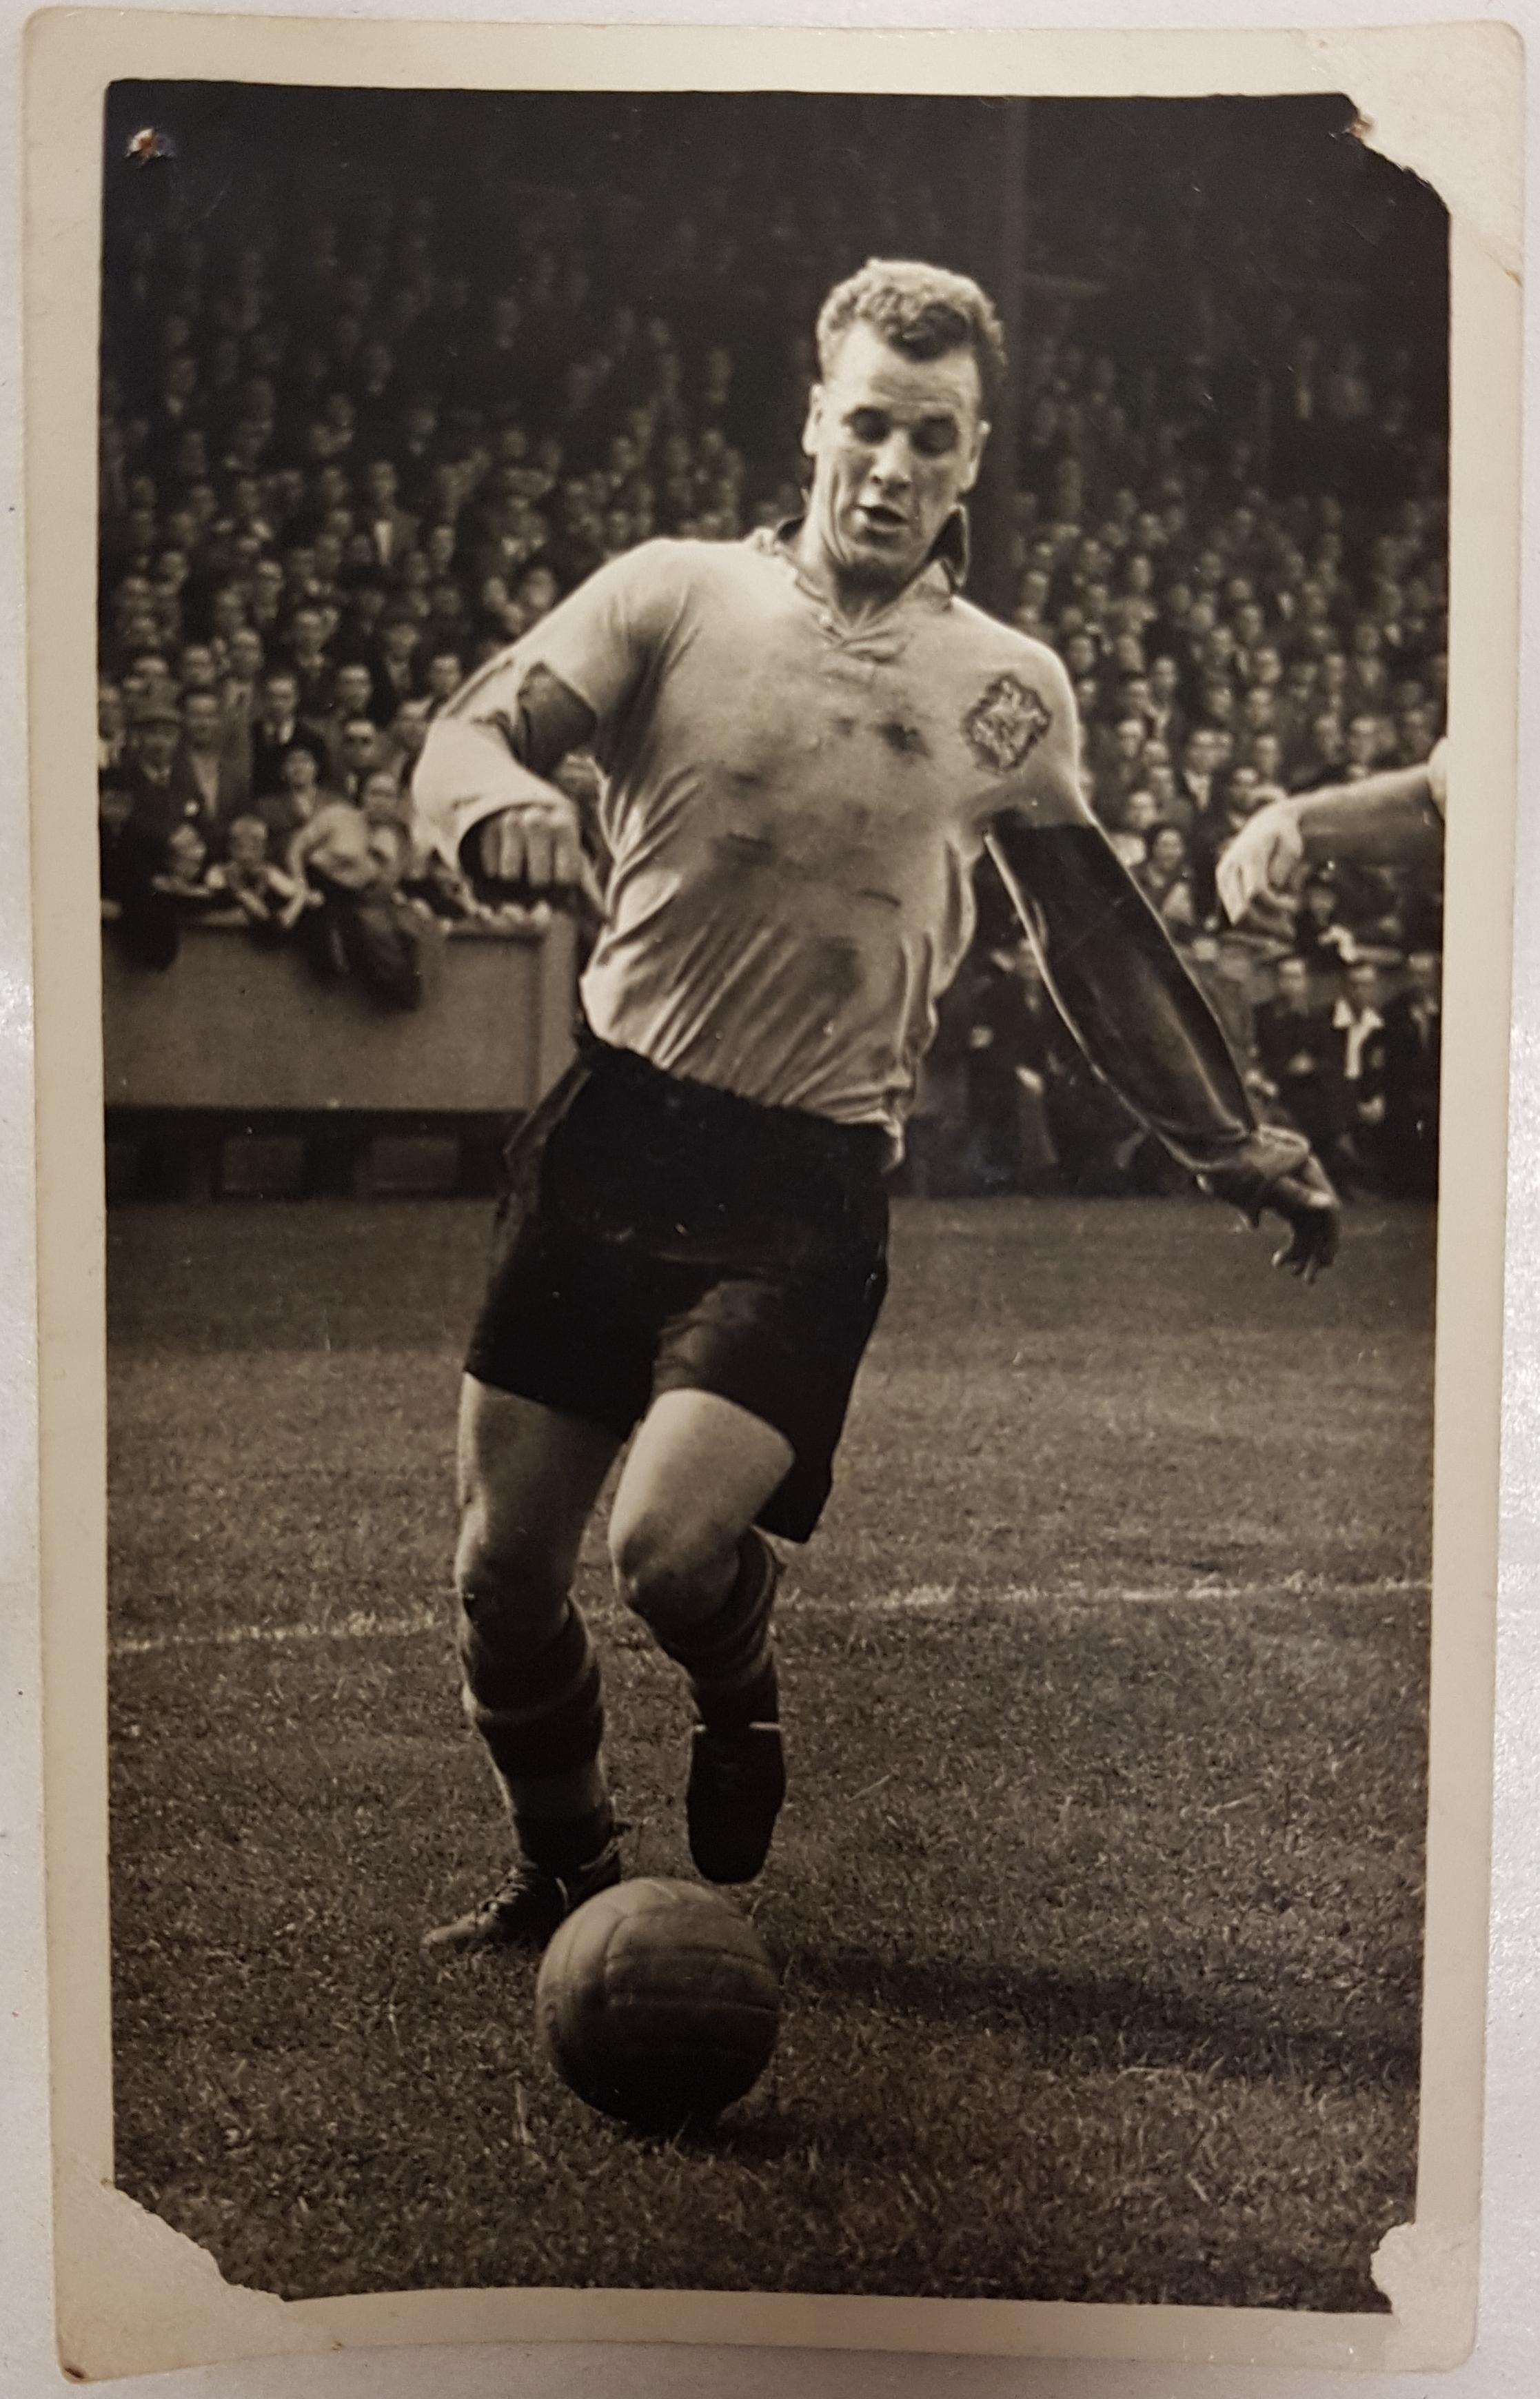 Black and white photograph of John Charles playing football